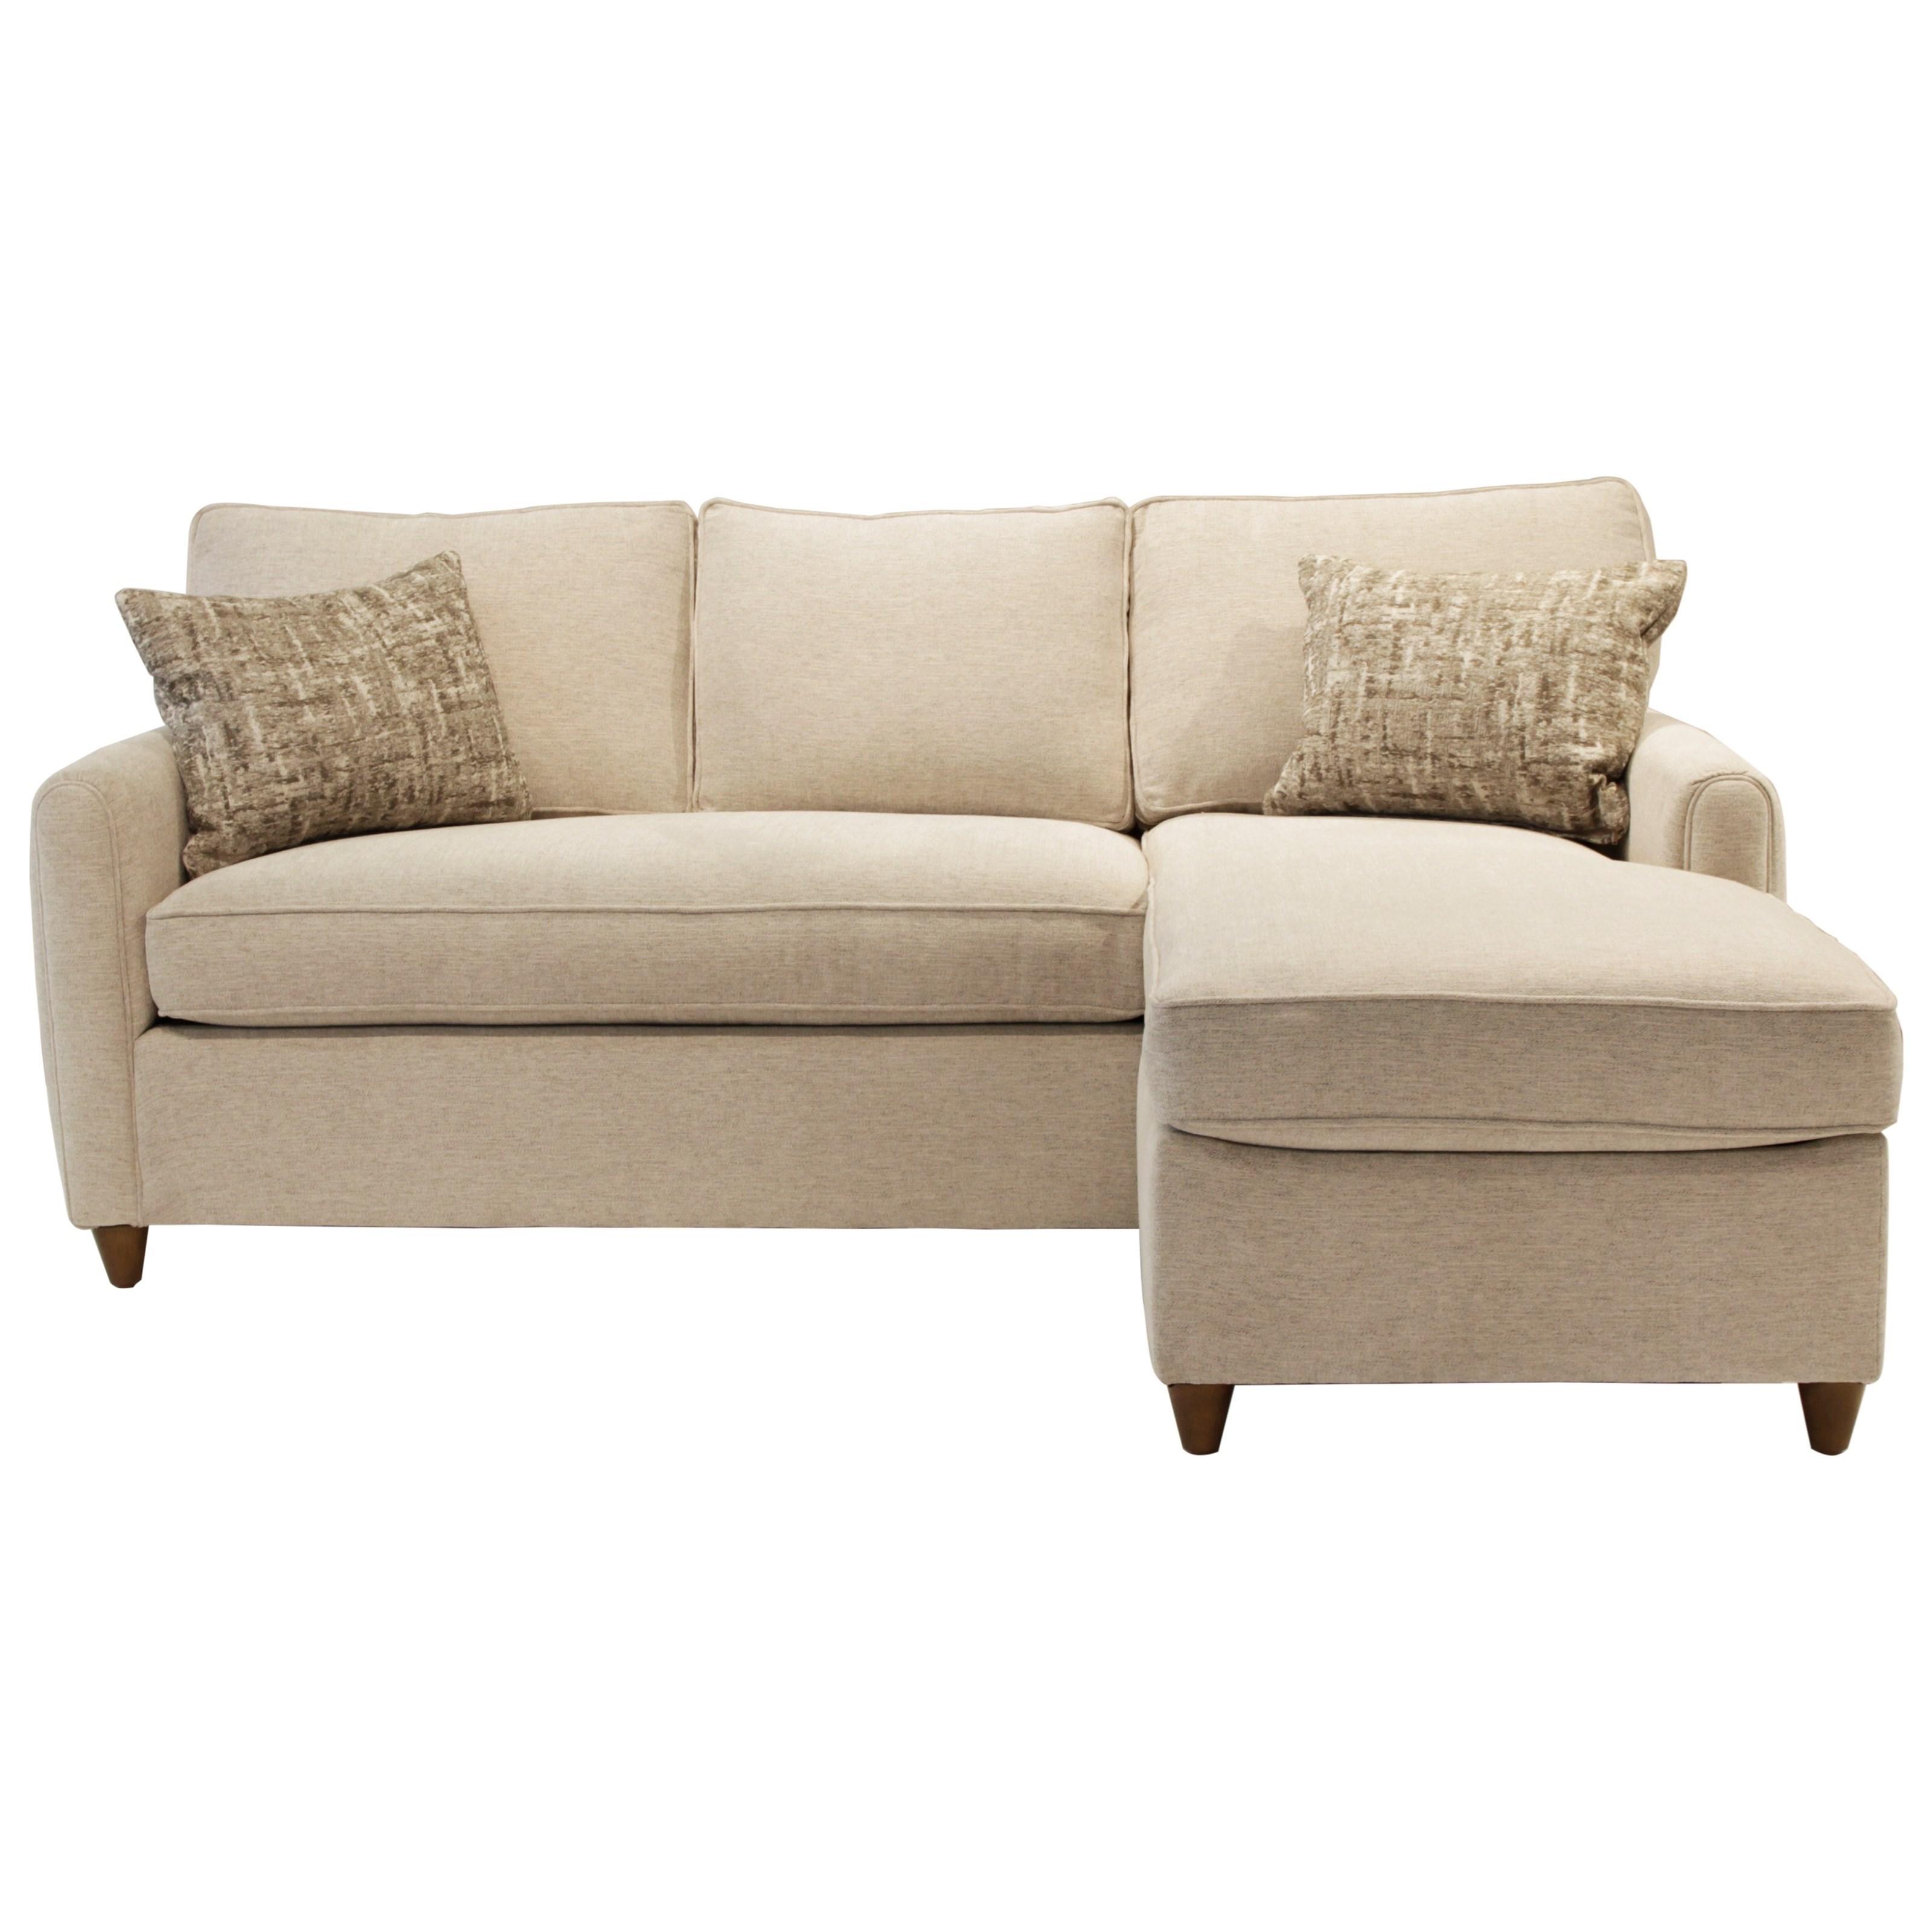 Jonathan Louis EmoryQueen Sleeper Sofa With Chaise ...